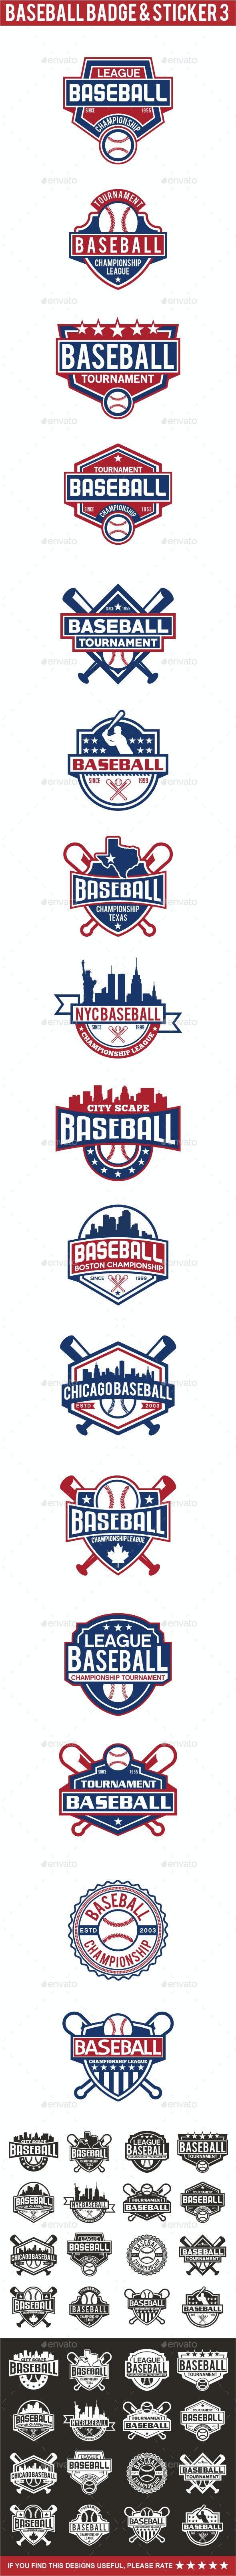 Baseball Badge & Stickers 3 - Badges & Stickers Web Elements